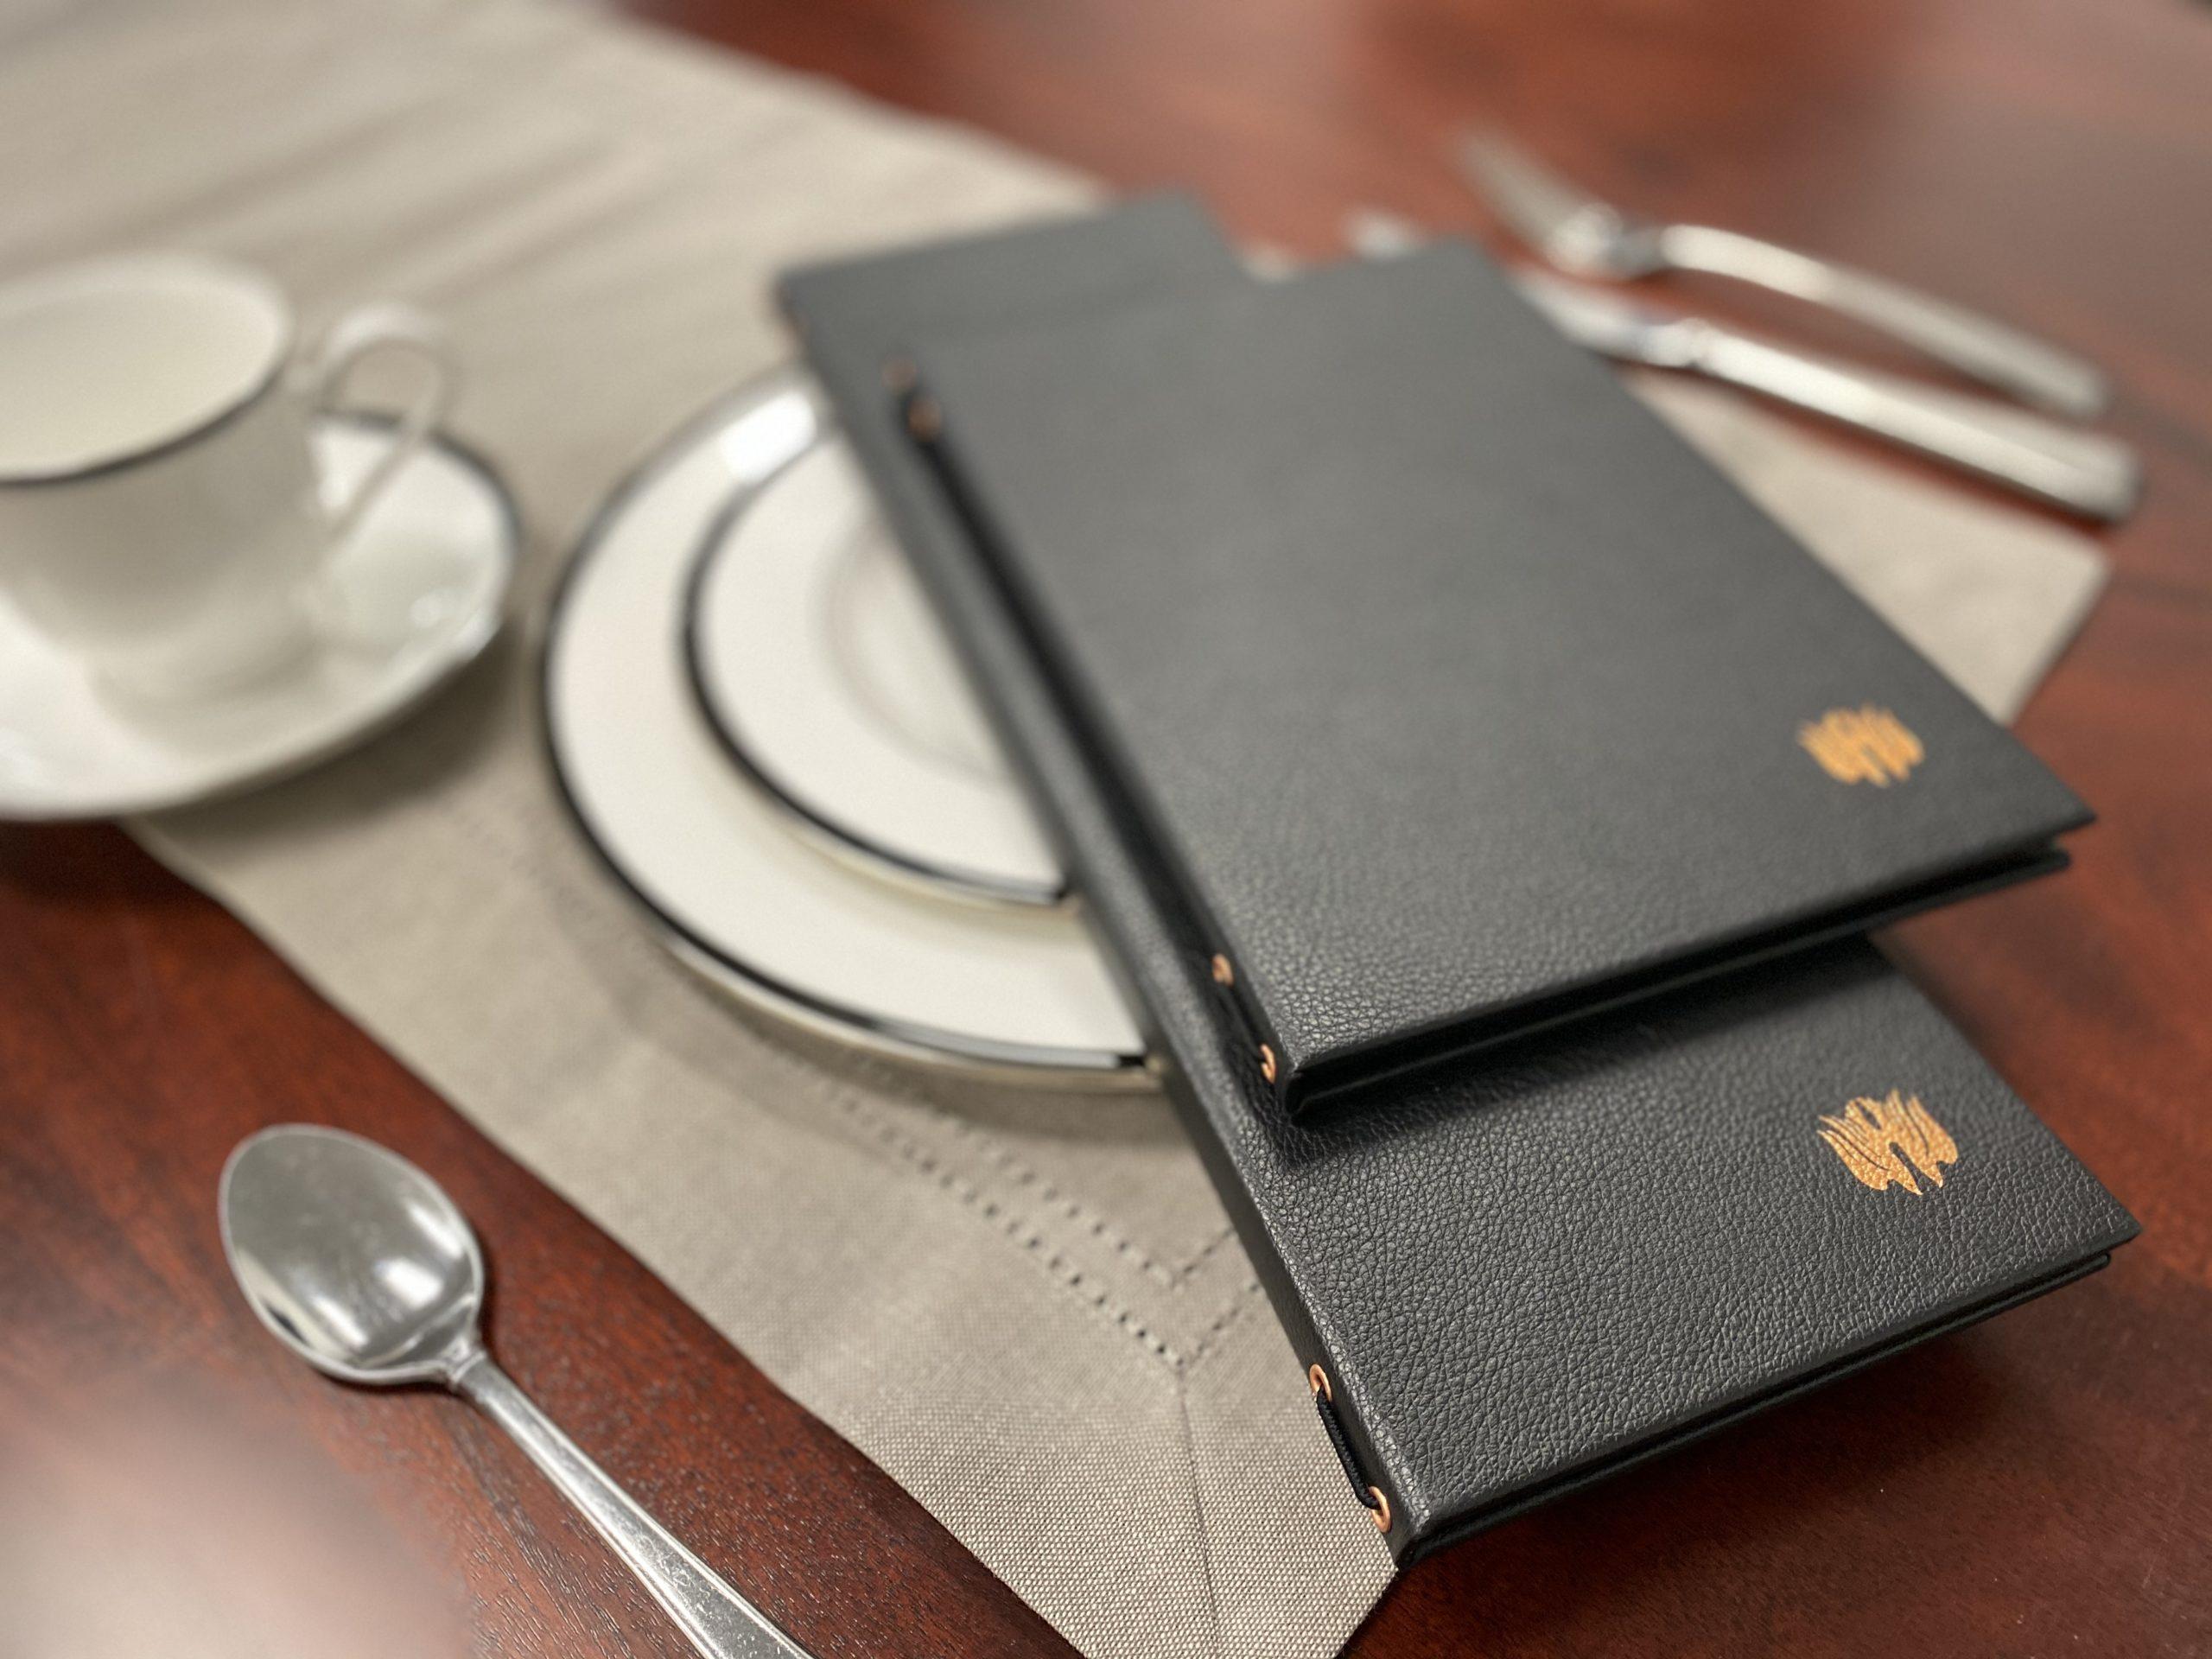 Restaurant menu covers & accessories